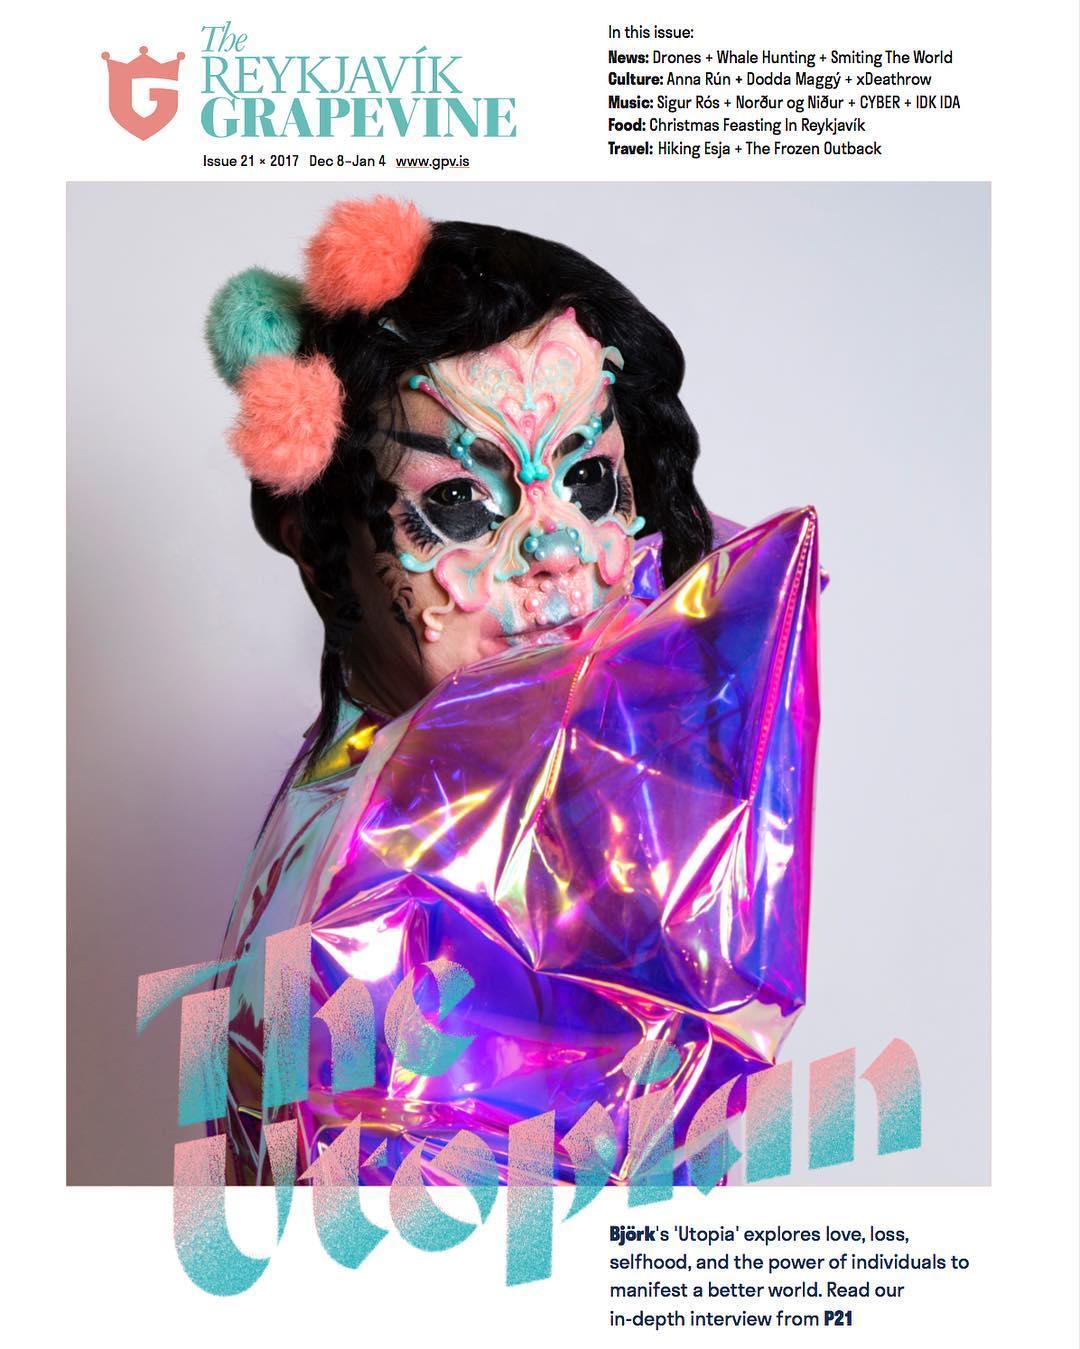 The Reykjavik Grapevine Björk (2017)